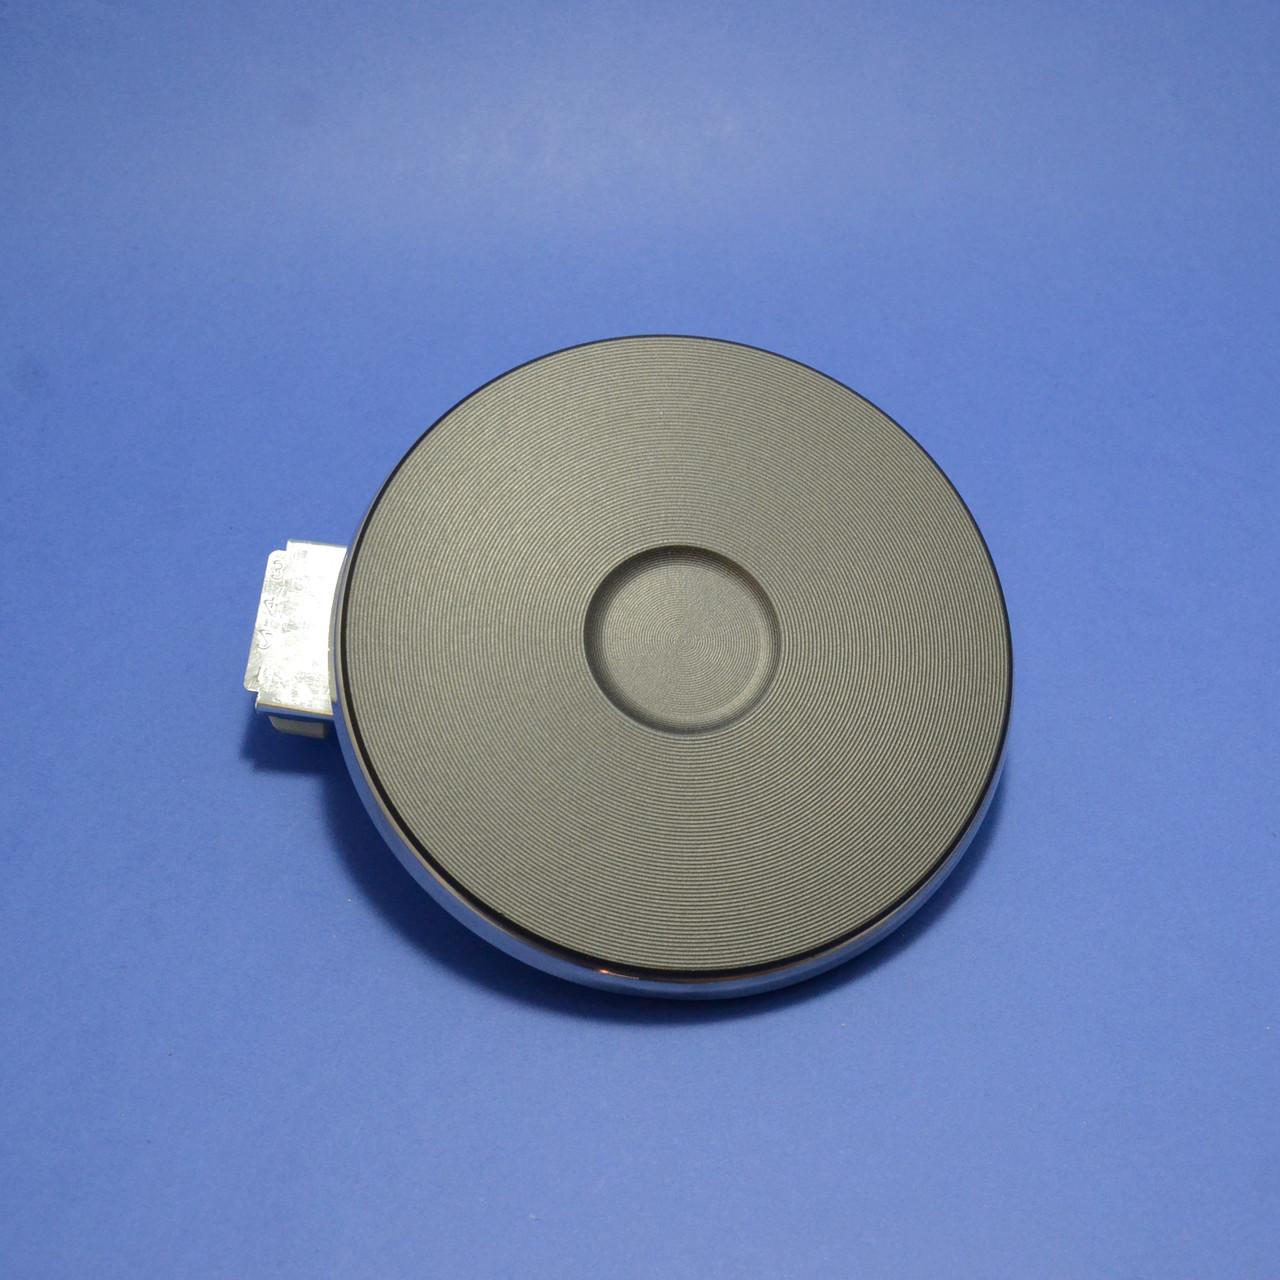 Конфорка для электроплиты 1000W диаметр 145мм